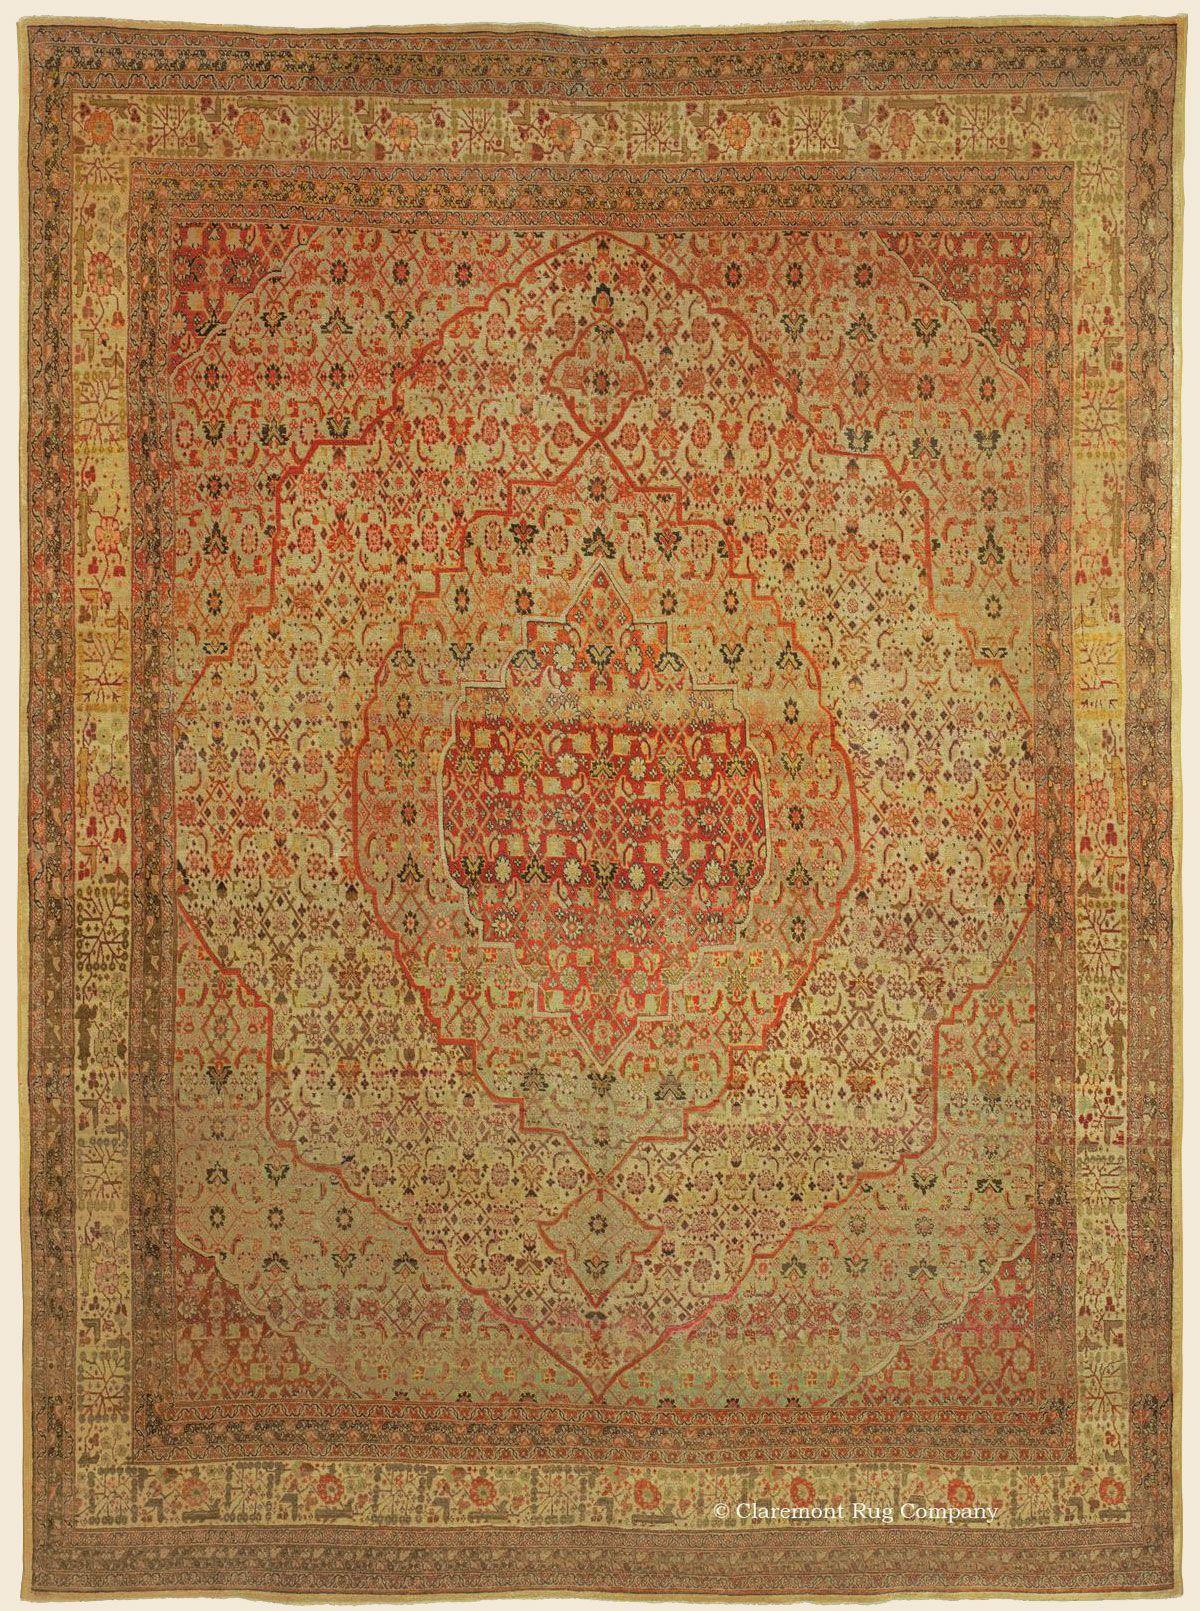 Hadji Jallili Haji Jalili Tabriz Northwest Persian Antique Rug 9 4 X 12 7 Late 19th Century Claremont Rug Rugs On Carpet Rugs Claremont Rug Company